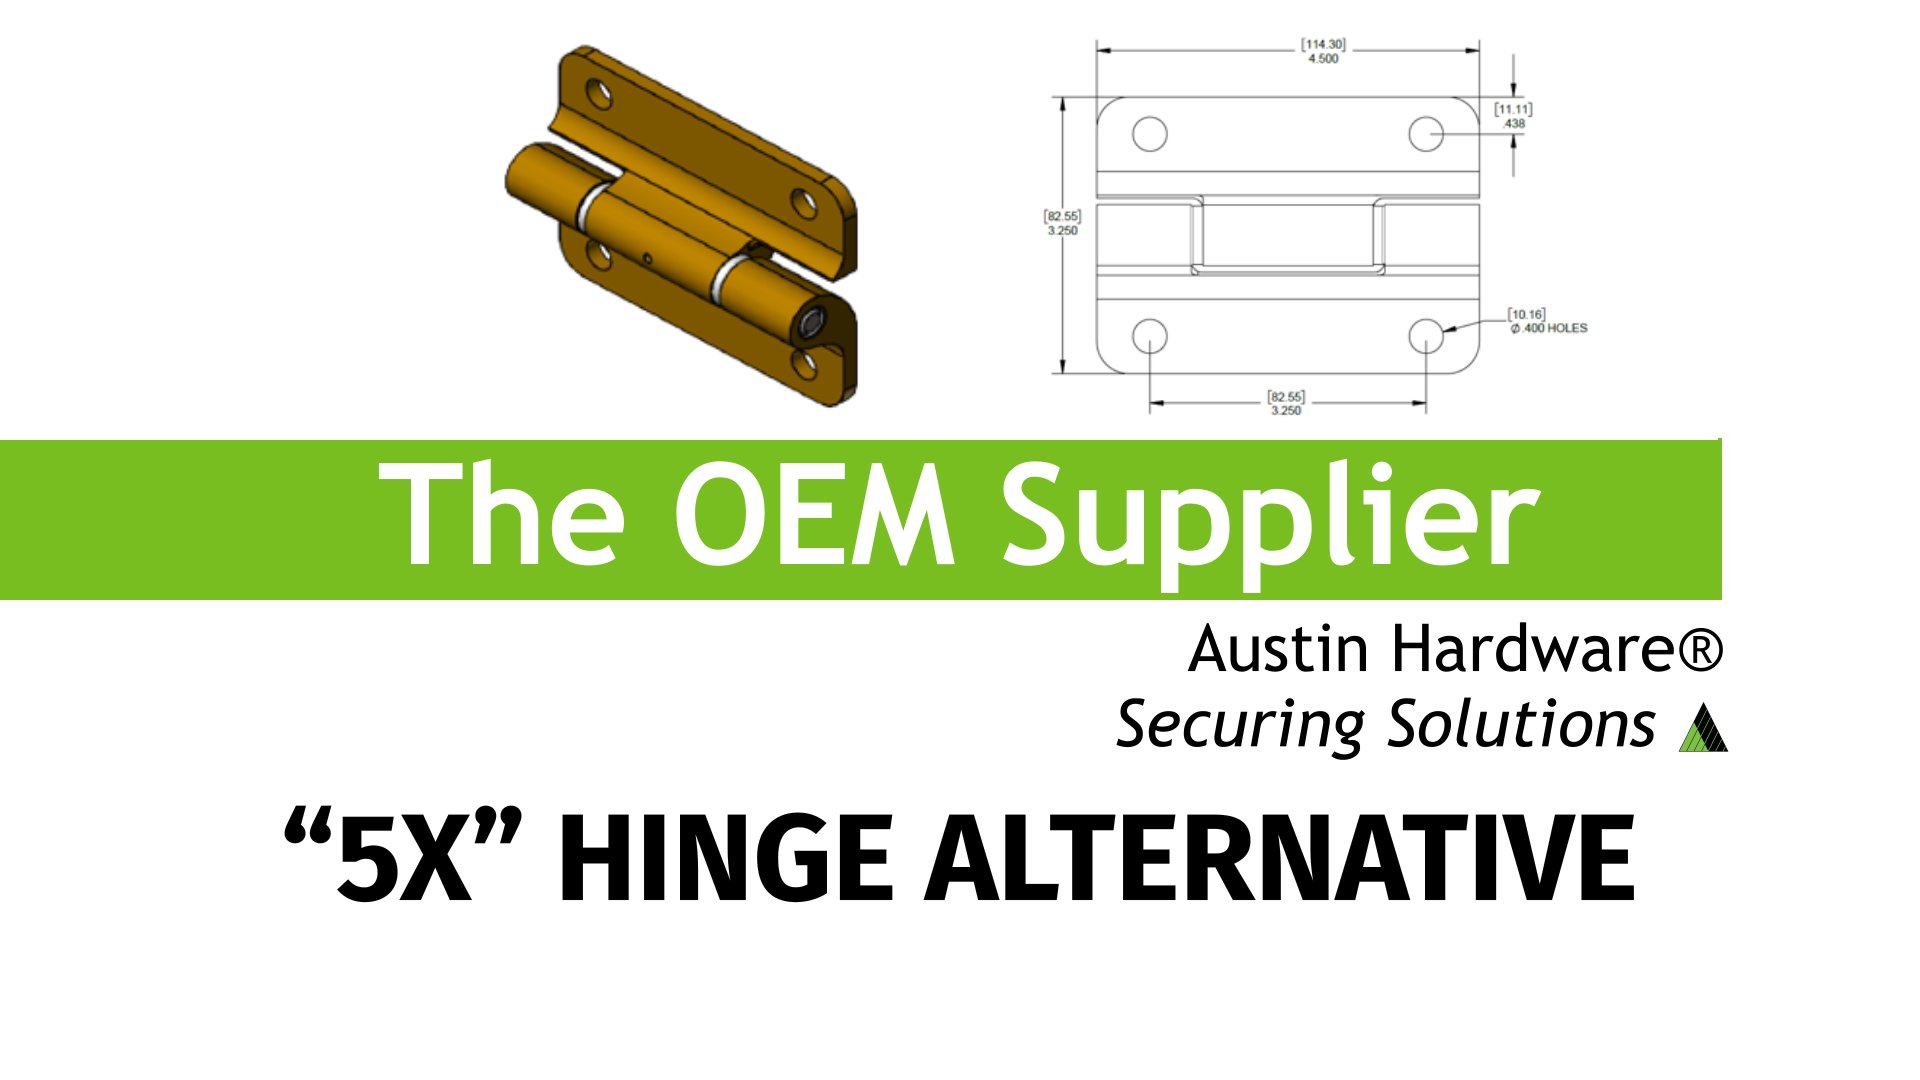 5x Hinge Alternative Austin Hardware®